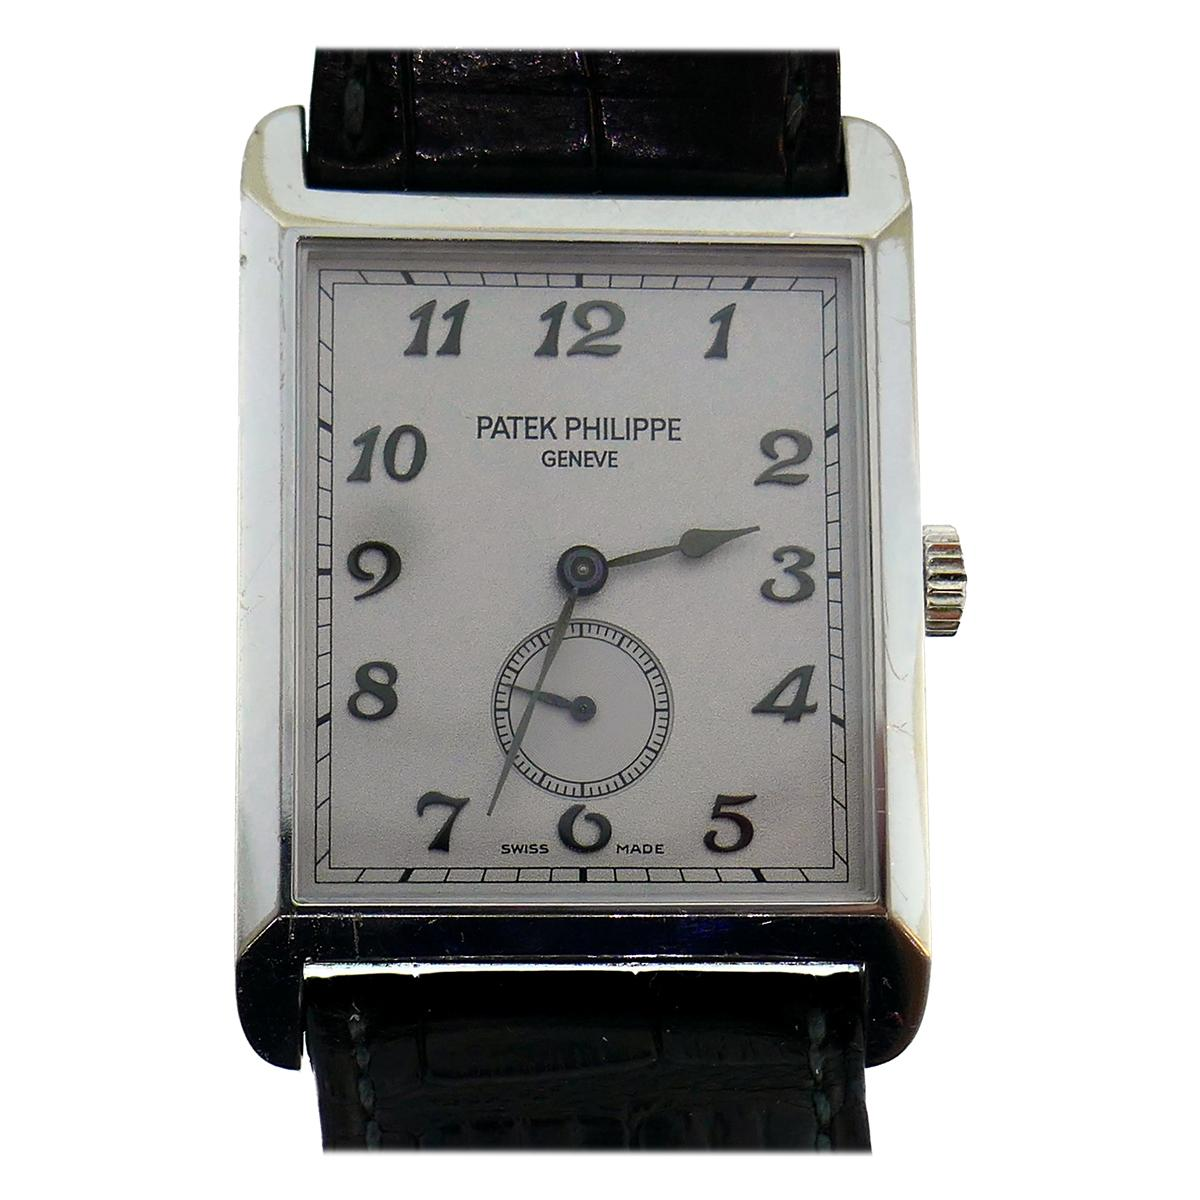 Patek Philippe White Gold Manual Wind Wristwatch